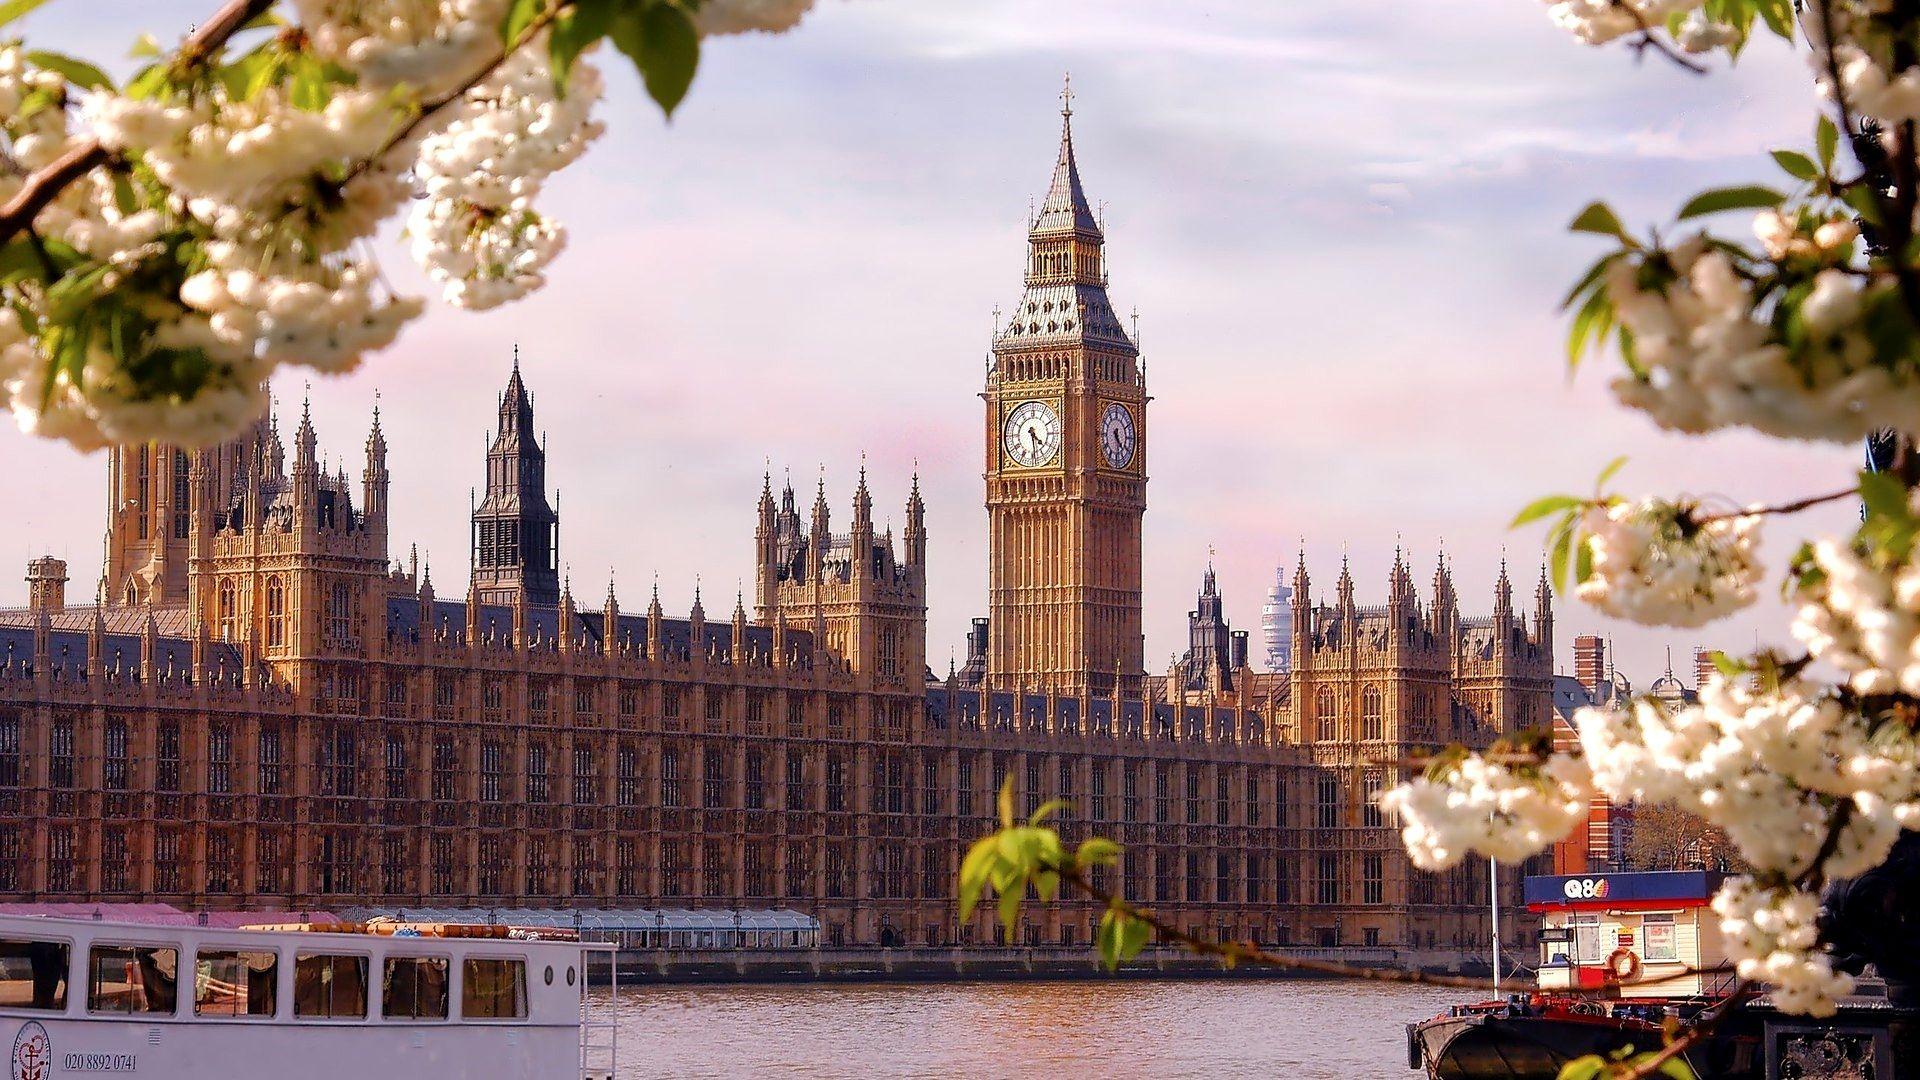 London Wallpaper 4k Pc Trick 4k London Wallpaper Houses Of Parliament London Big Ben